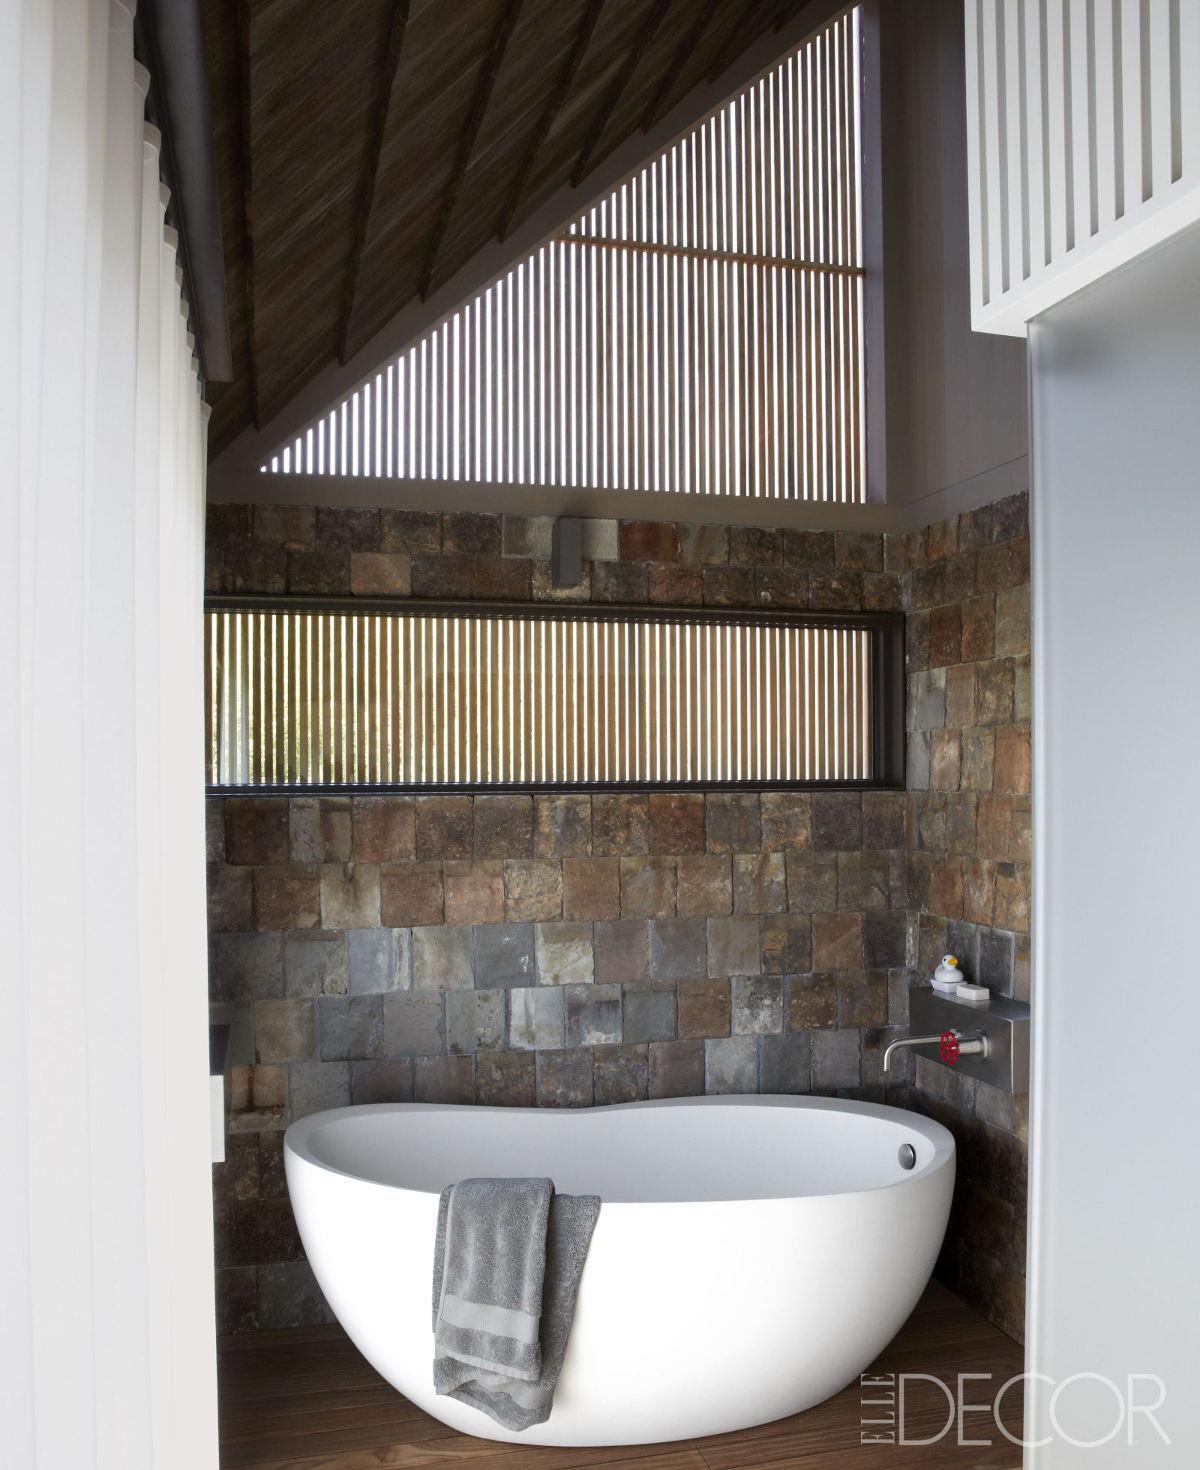 architectural shingles - bathroom ceiling covered by cedar shingles cedar shingles in a Long Island home by Paul Masi - ElleDécor via Atticmag